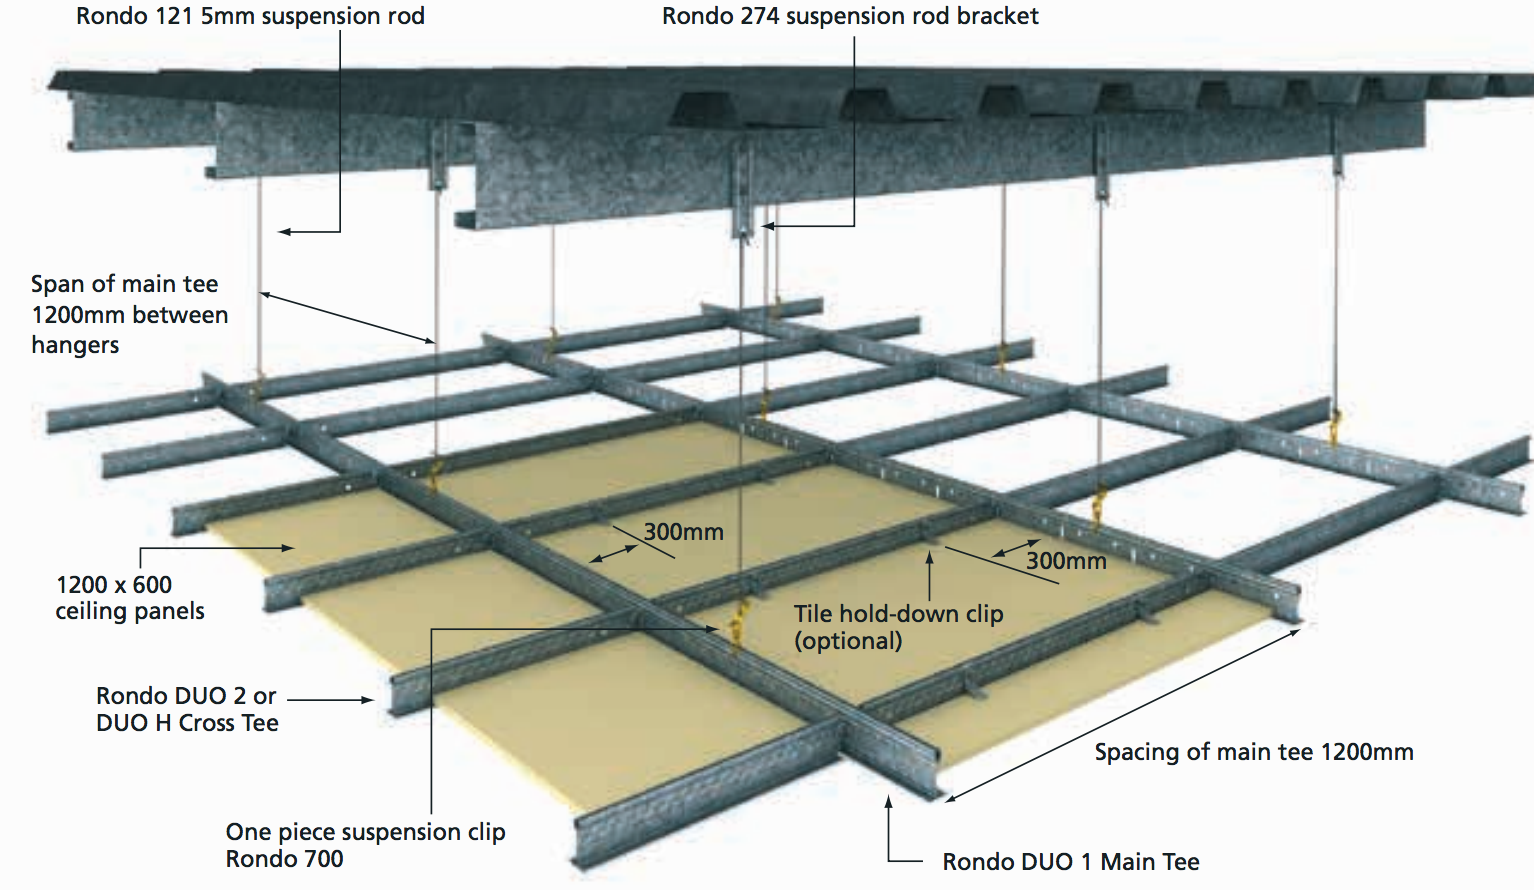 Pin By Zaynab Mohammed On Installart Suspended Ceiling Systems Ceiling System Suspended Ceiling